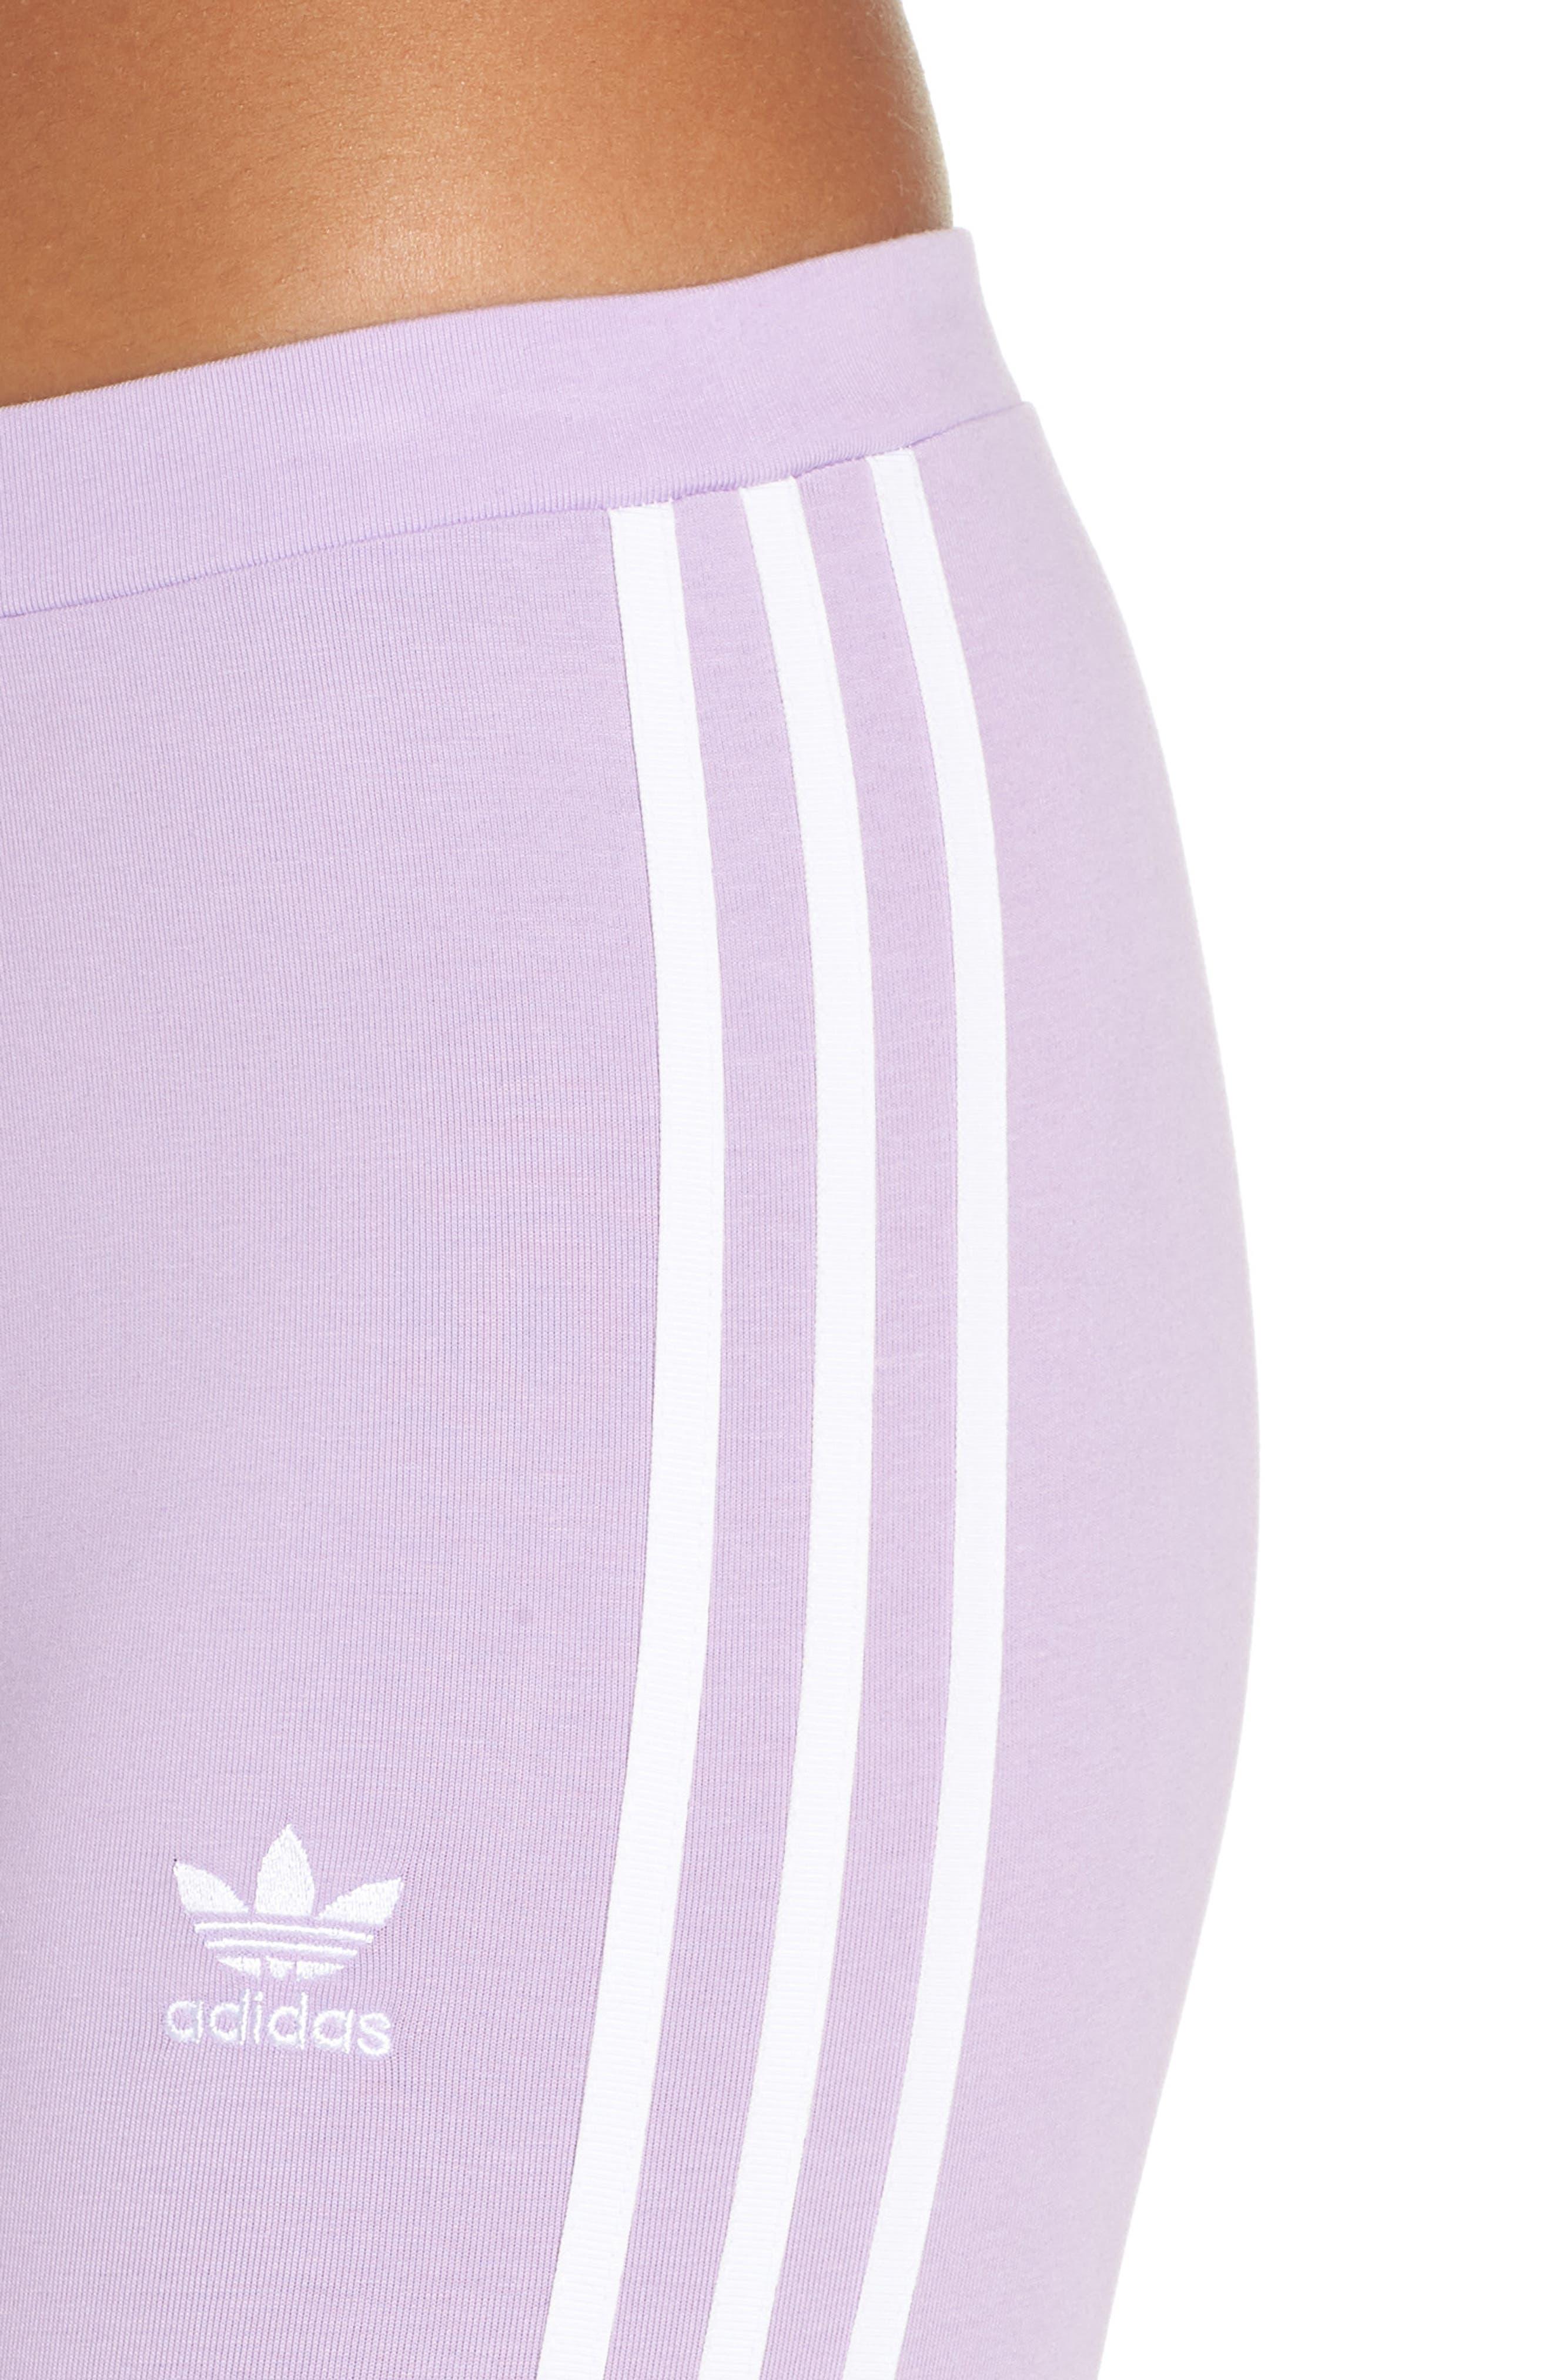 ,                             adidas 3-Stripes Tights,                             Alternate thumbnail 47, color,                             535